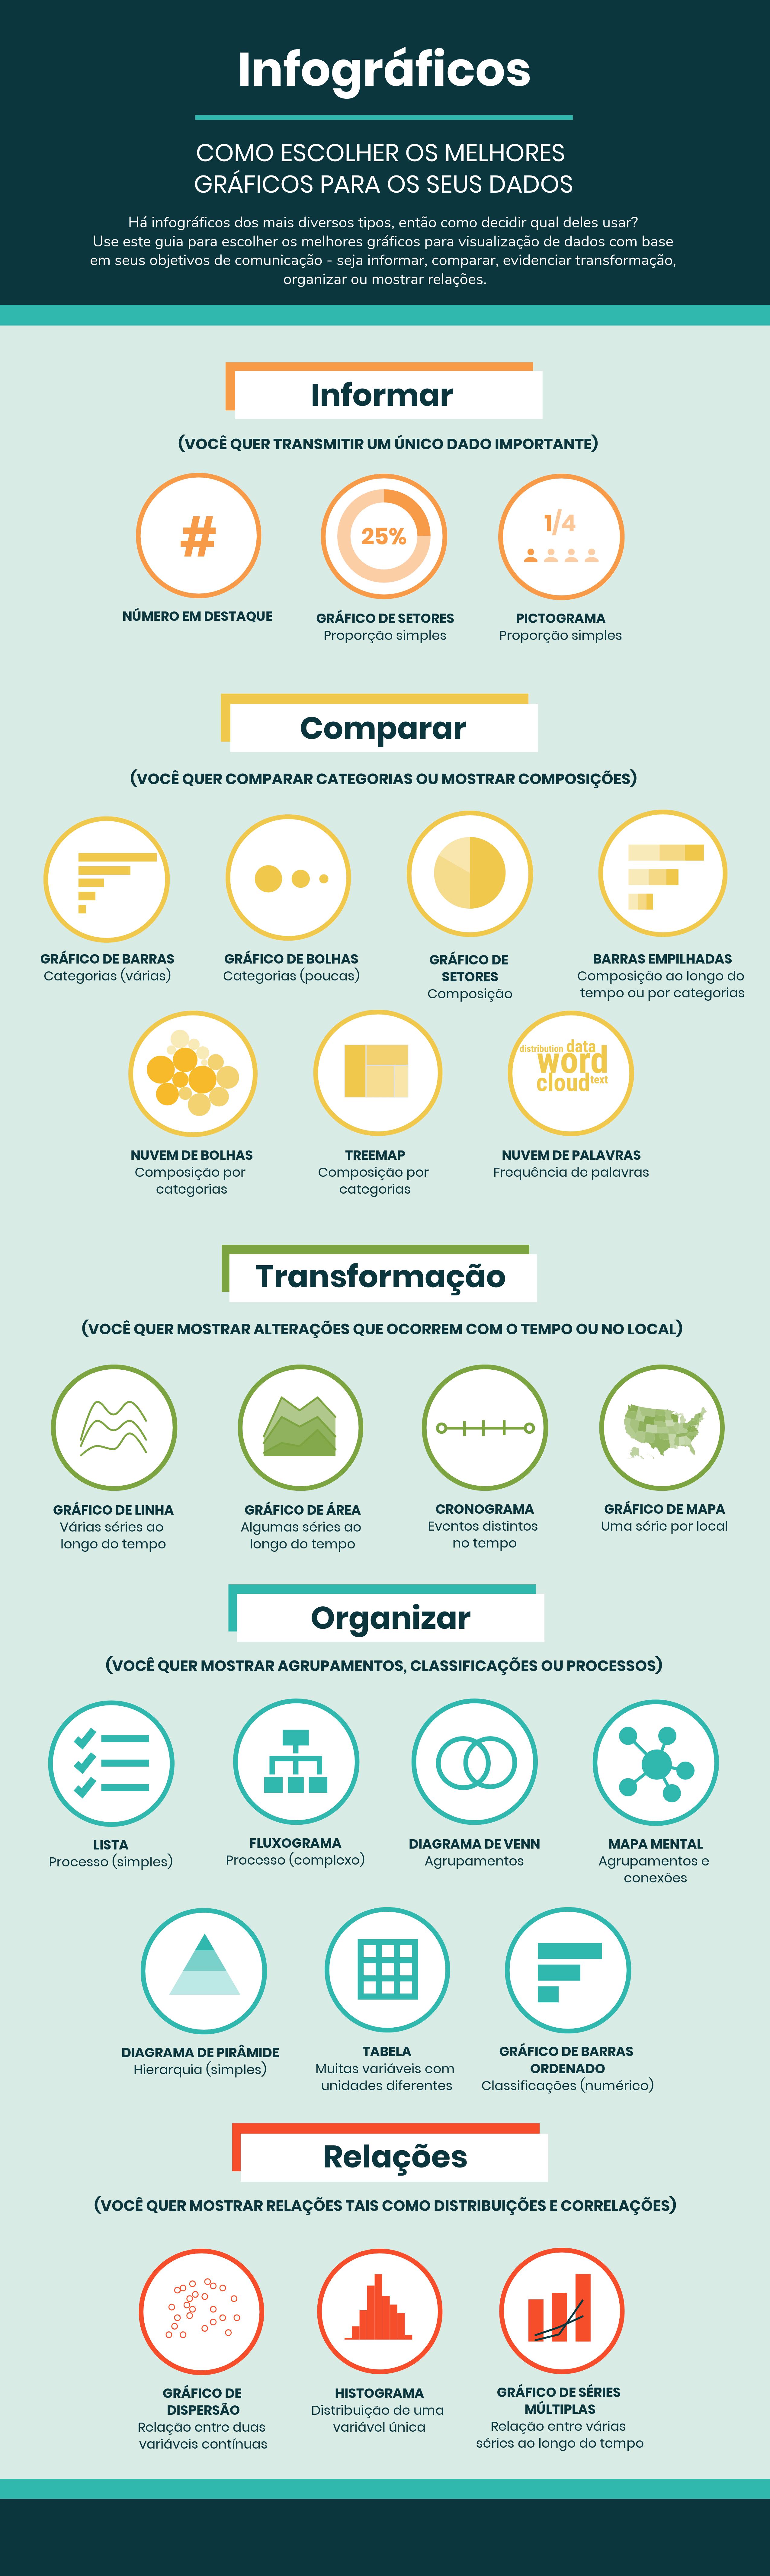 infografico tipos de graficos